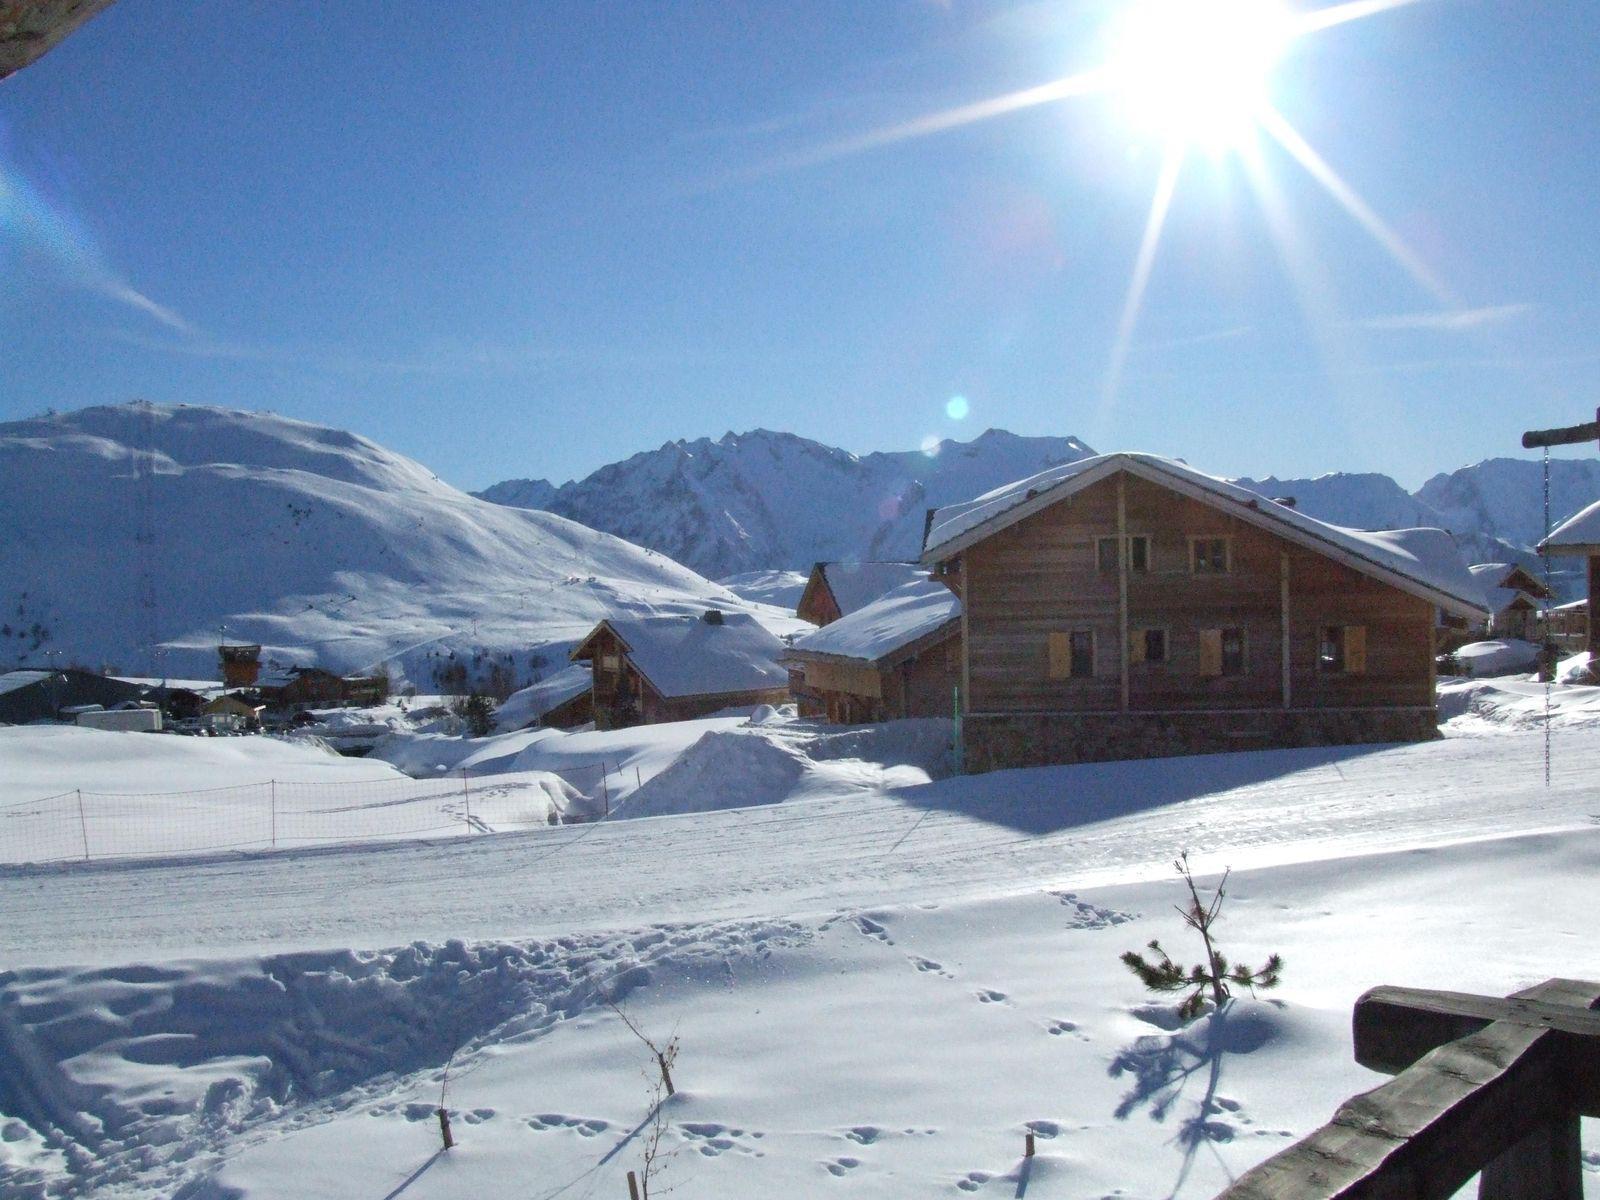 Station de ski d'Alpe d'Huez_Huez (1)